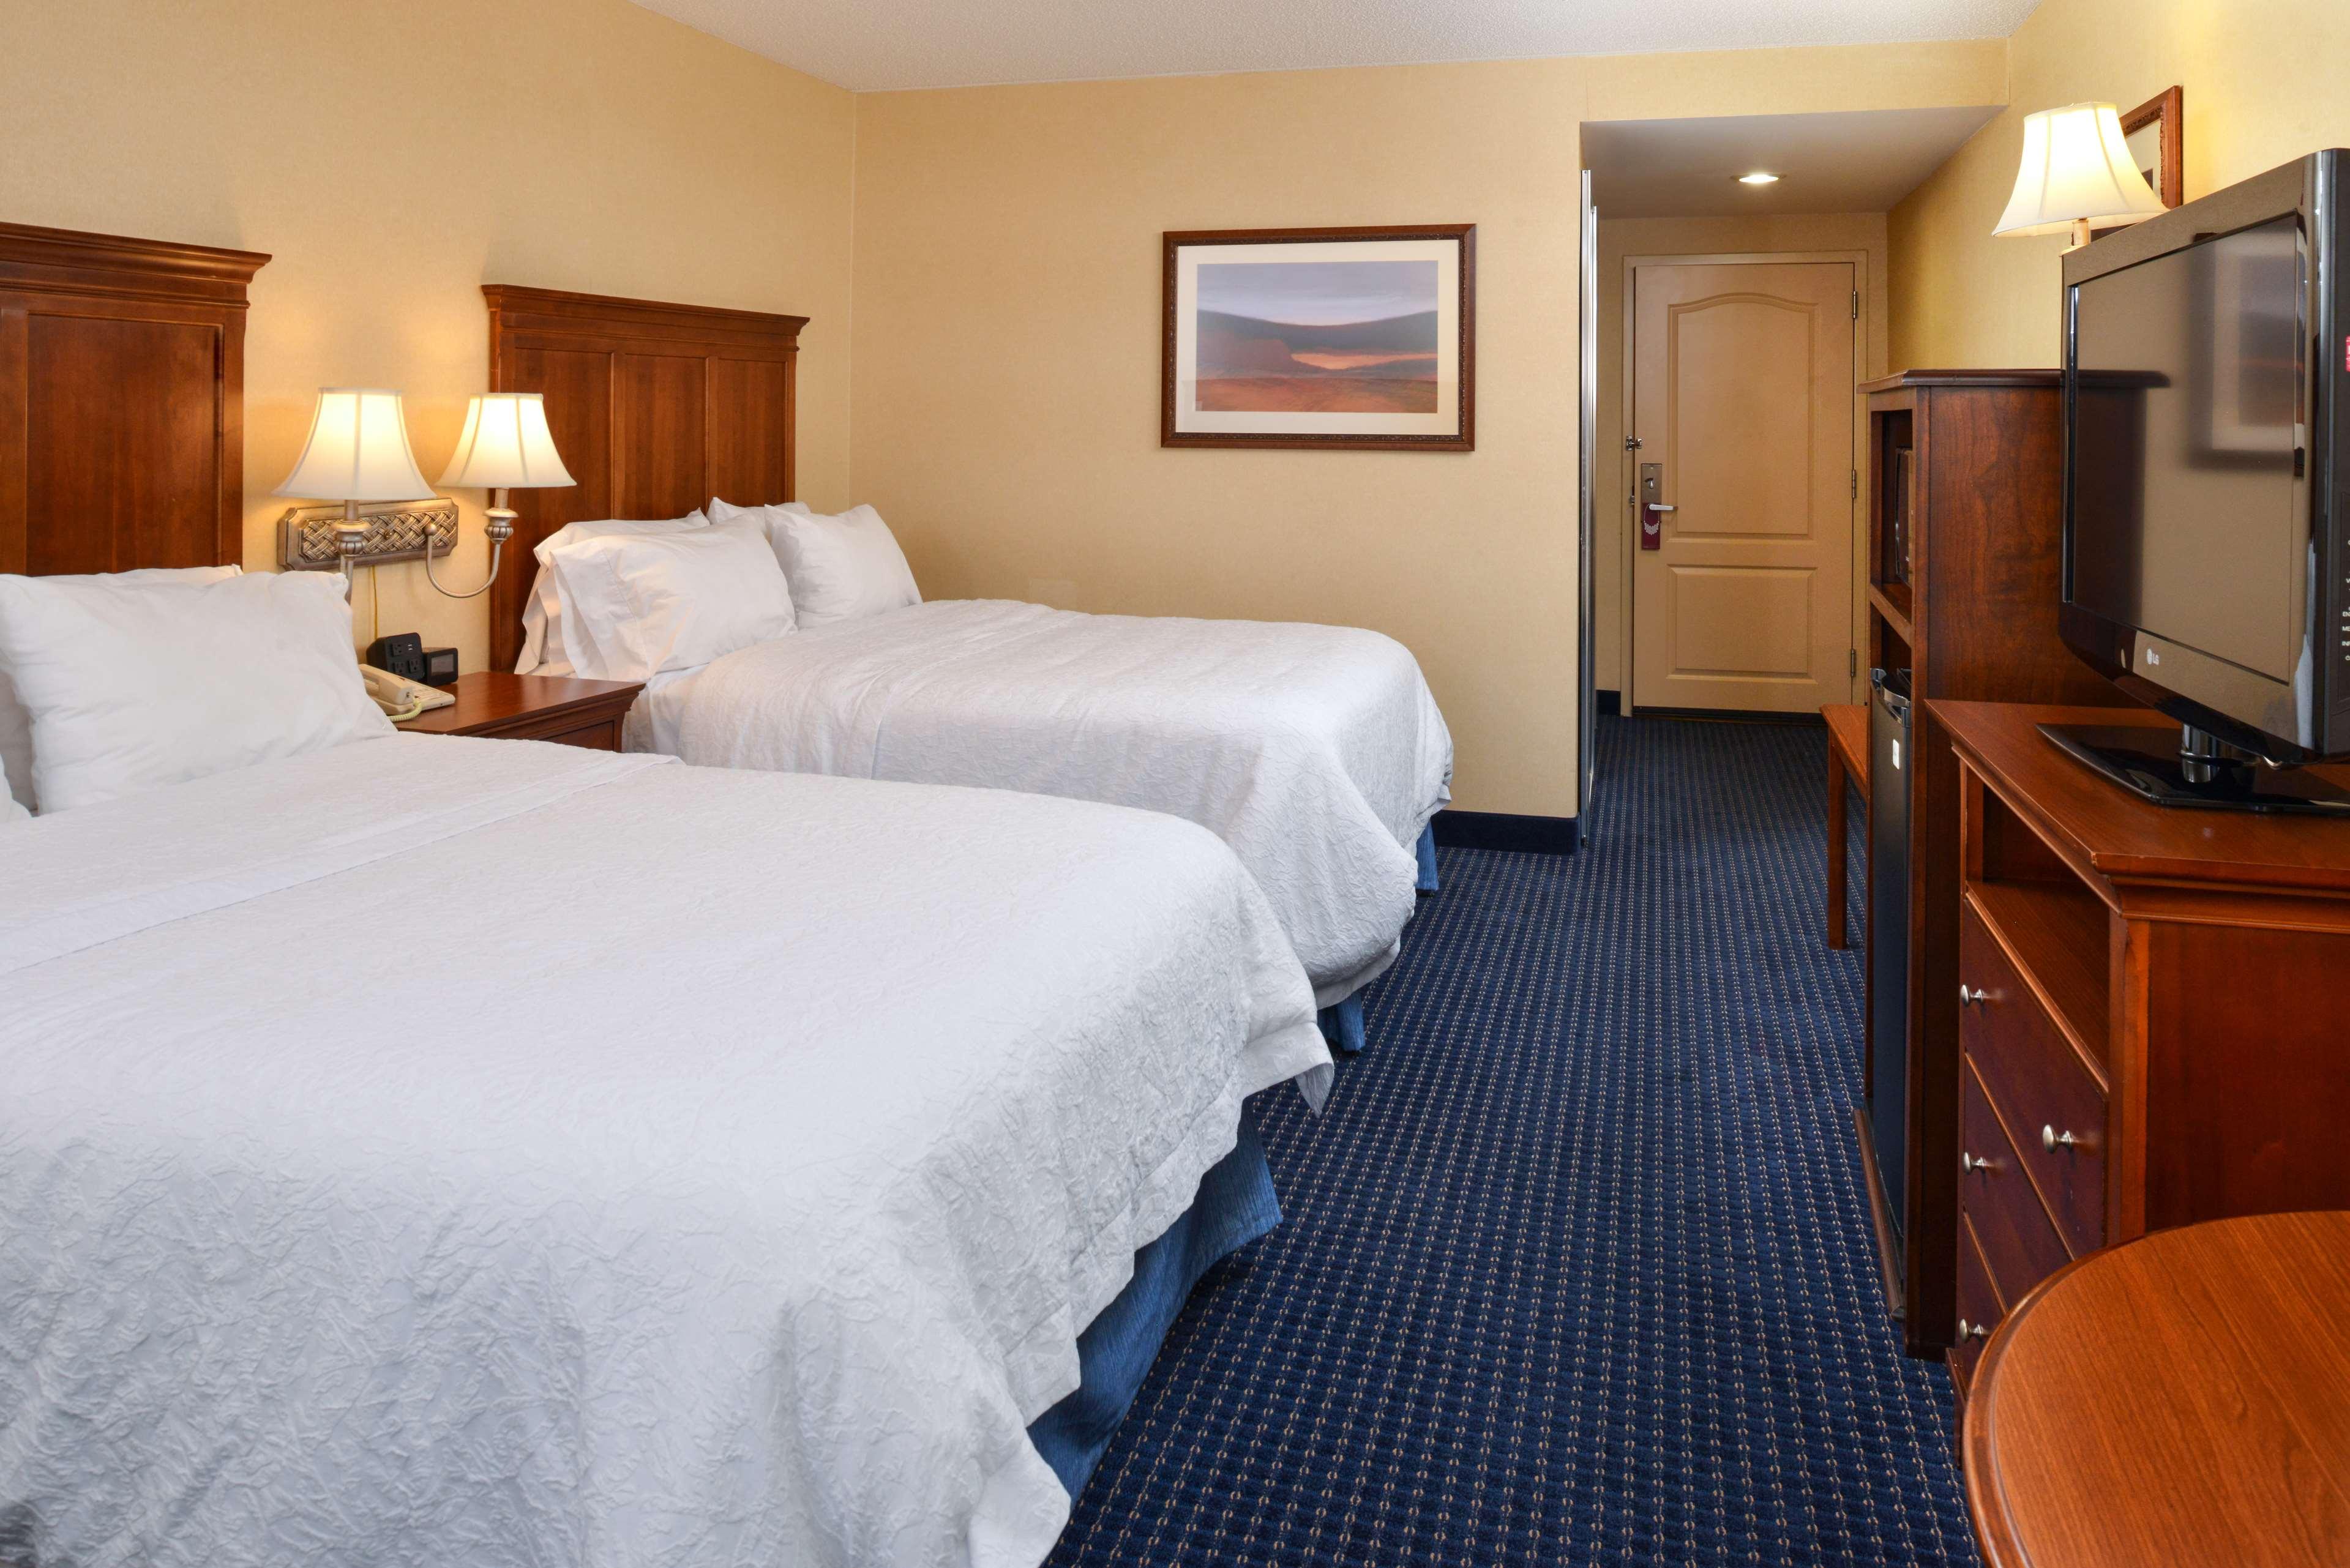 Hampton Inn & Suites Fredericksburg South image 43